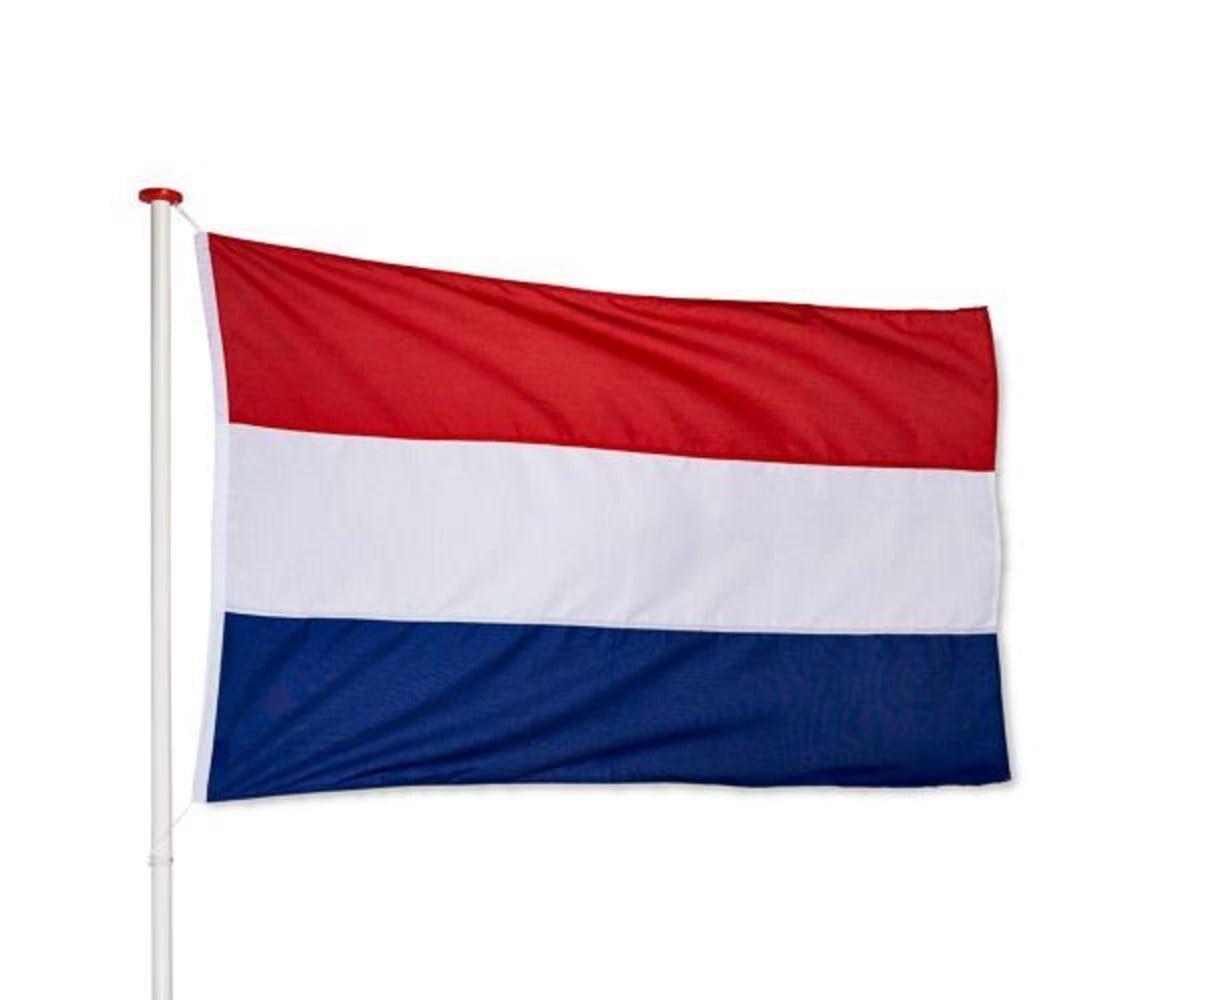 MELLO uit Groningen,Nederland